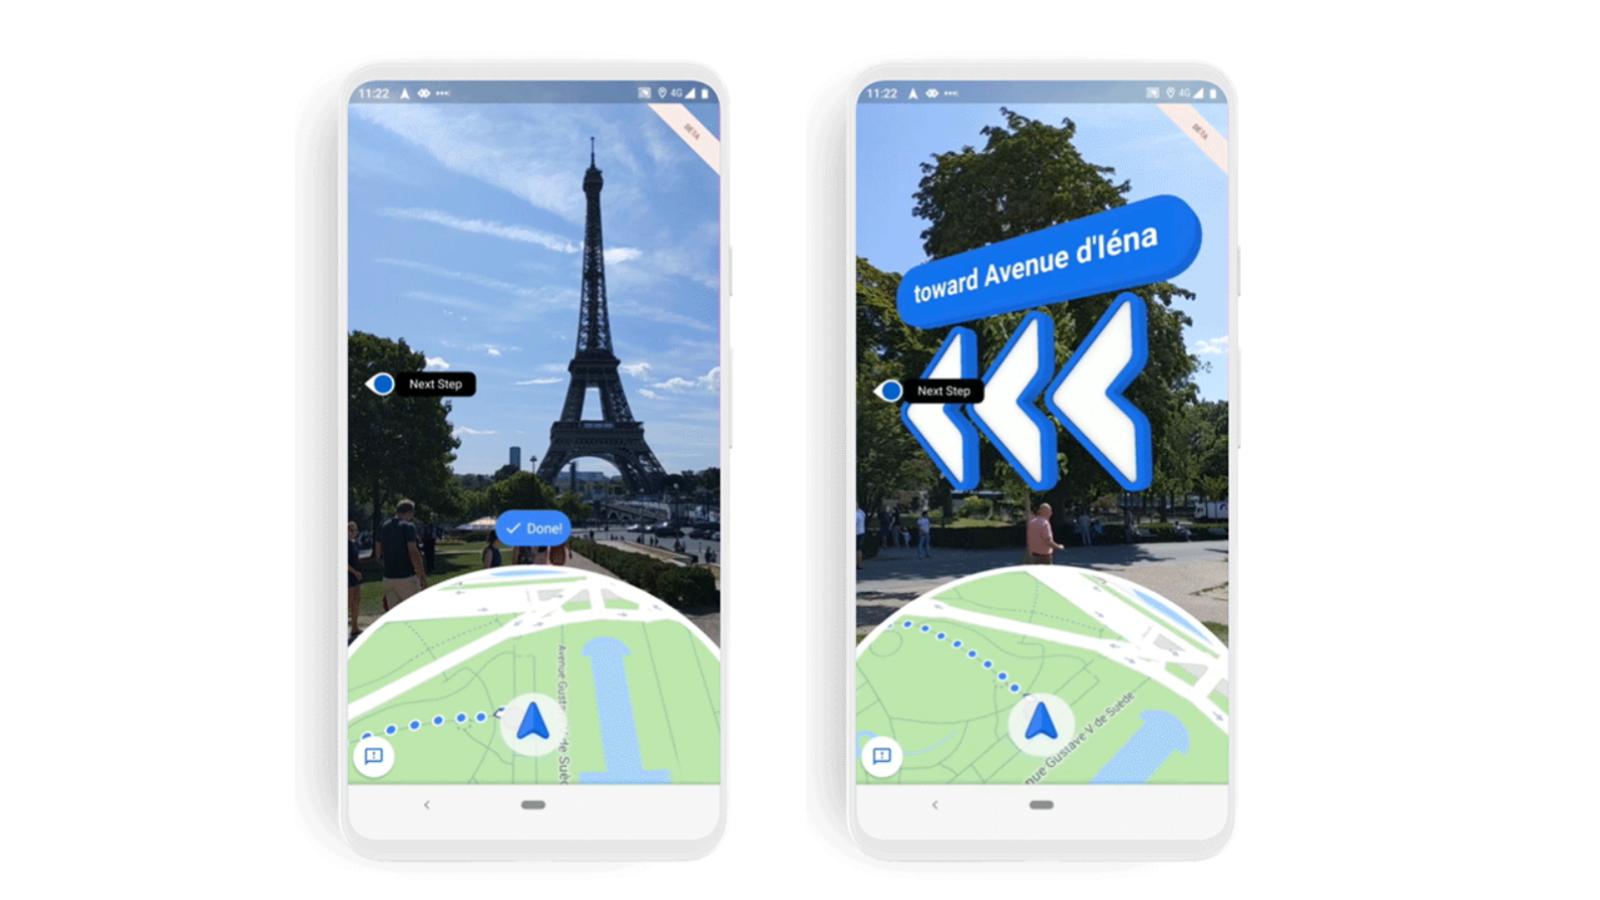 Google Maps' Visual Navigation